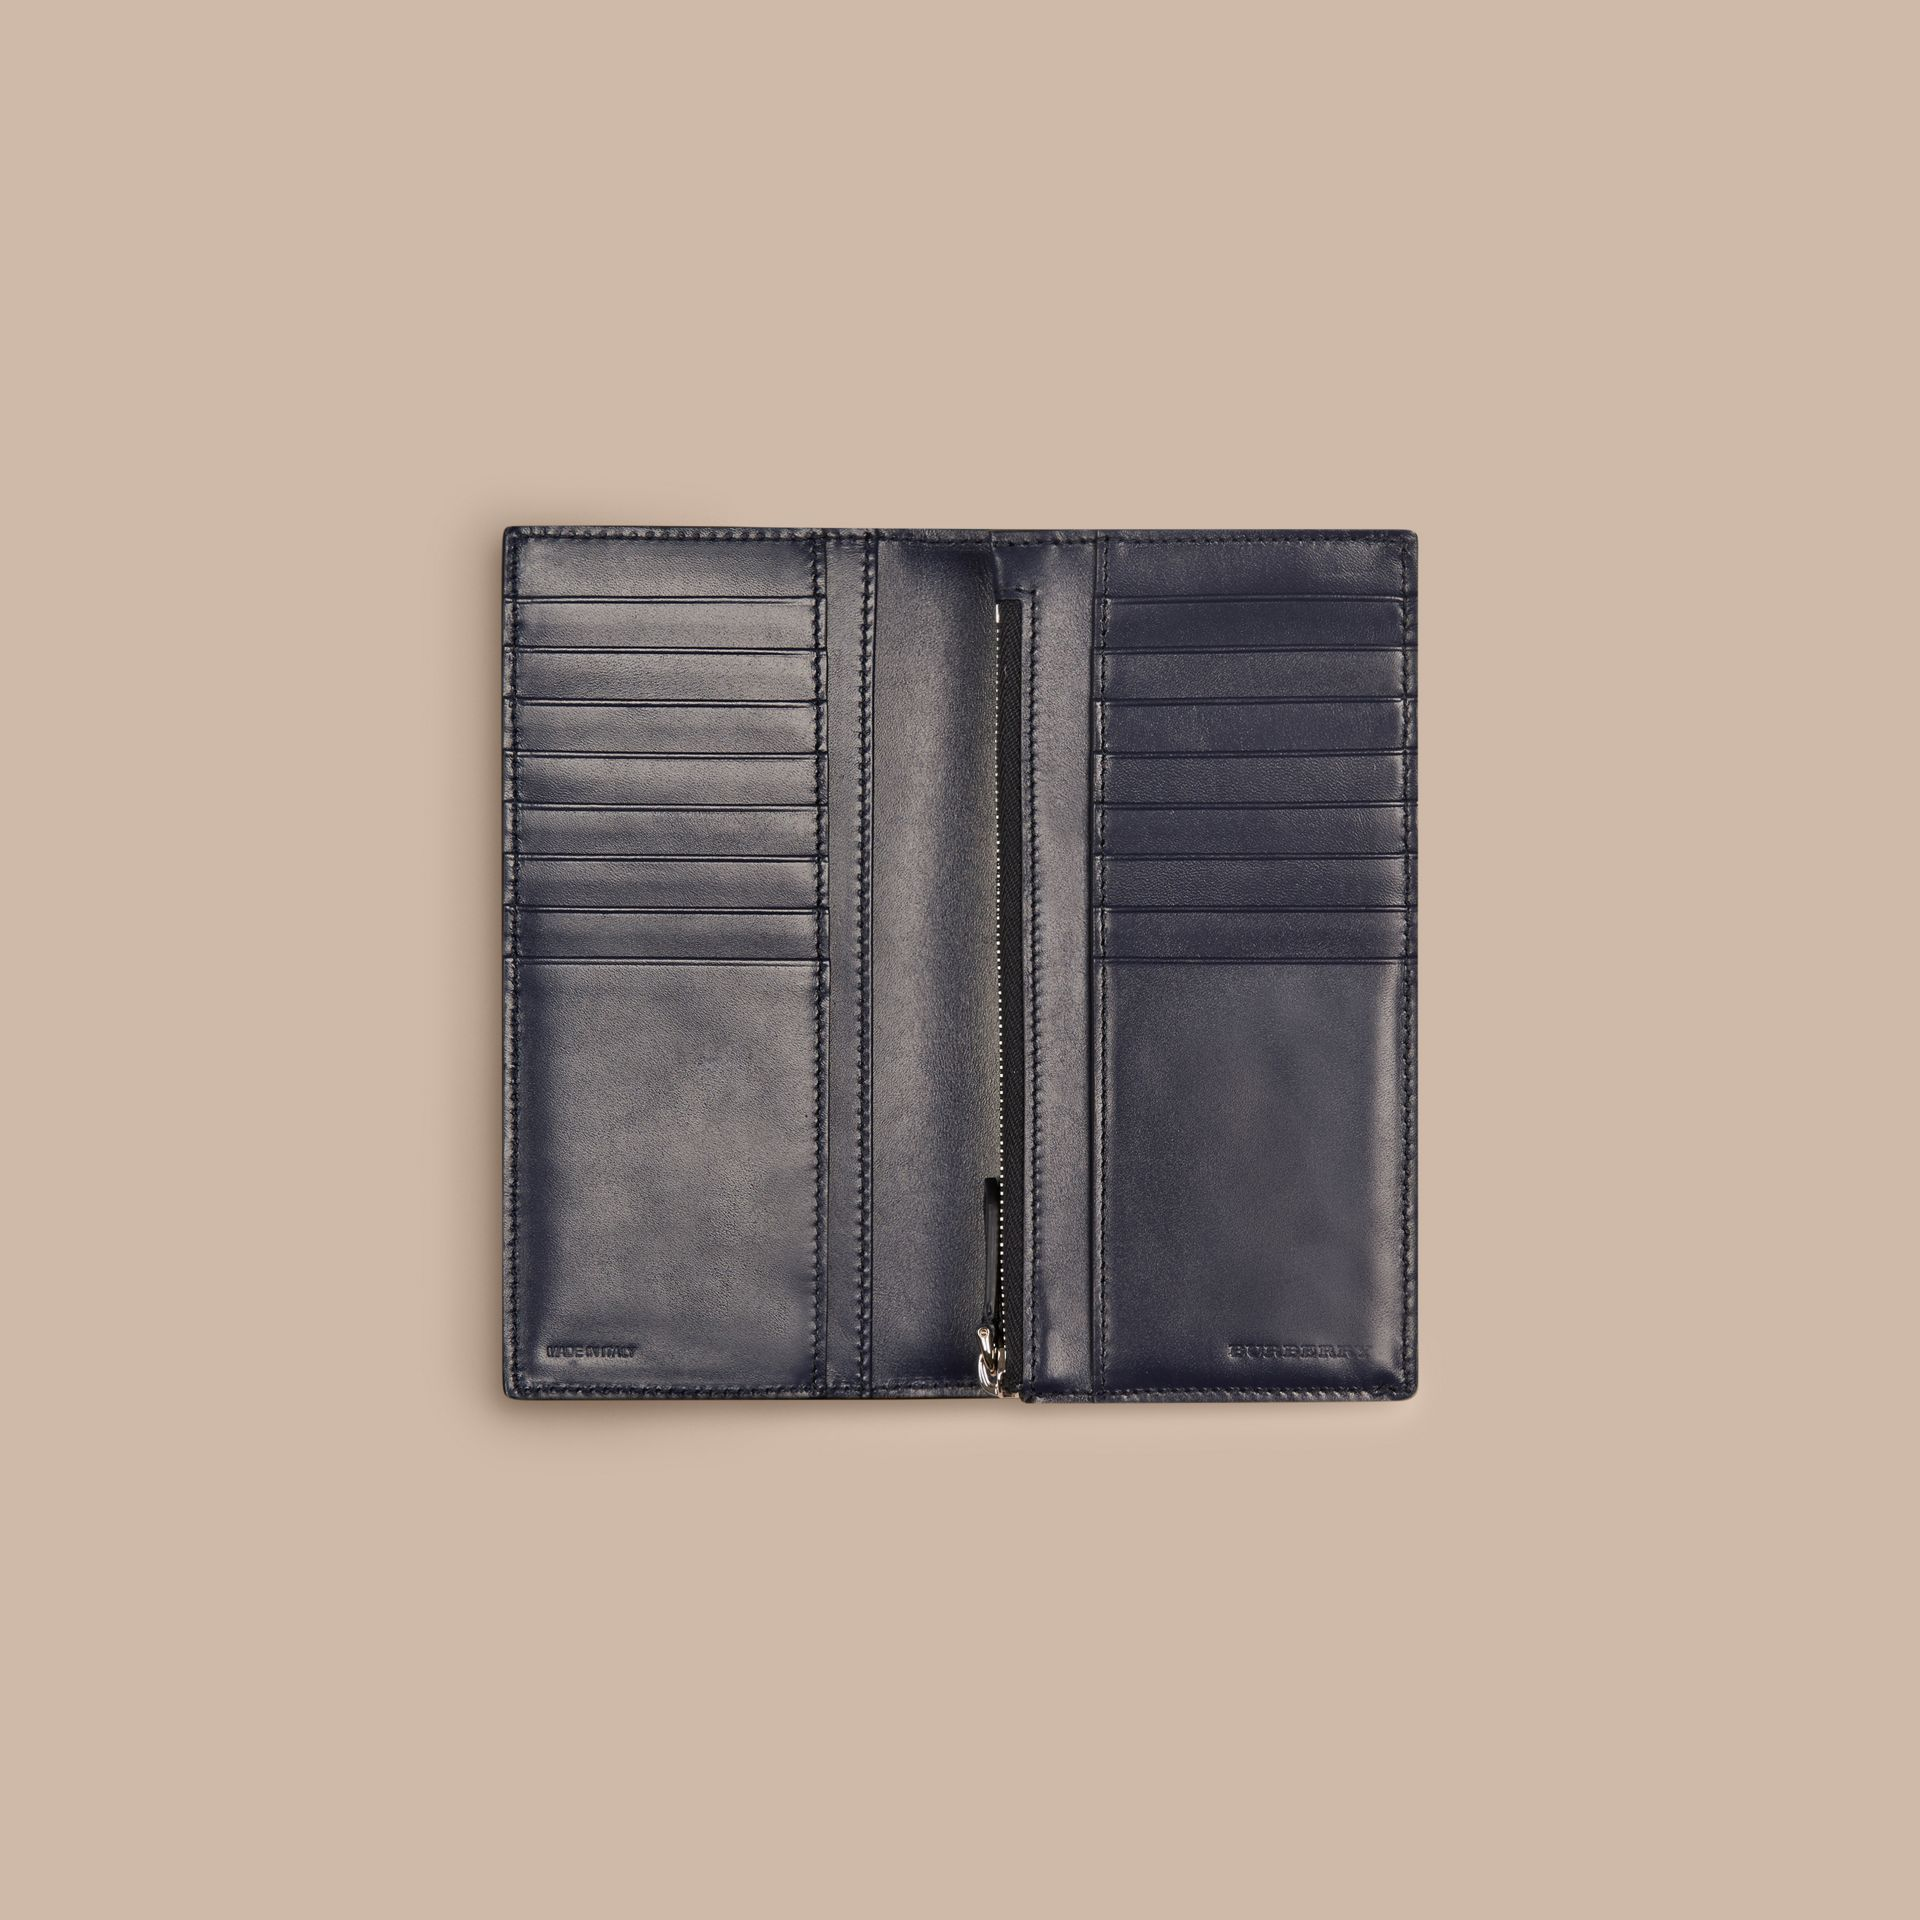 Dark navy London Leather Continental Wallet Dark Navy - gallery image 5